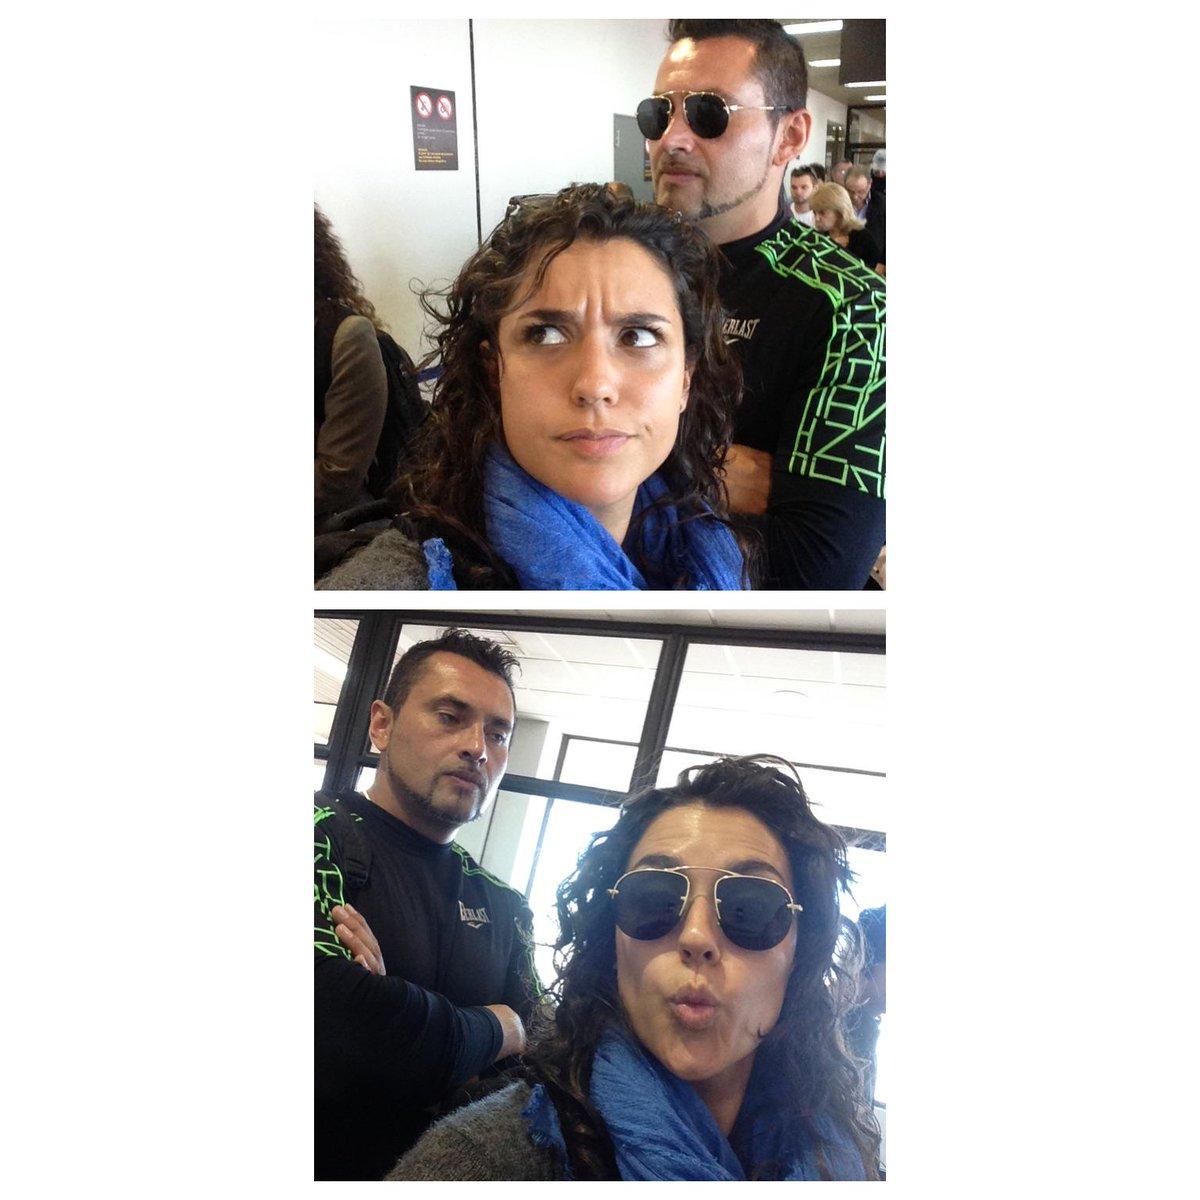 alba rico navarro (@AlbaRicoNavarro): No se si me sientan mejor a mi o al gallego @_ruggero http://t.co/lOOKPmN85z